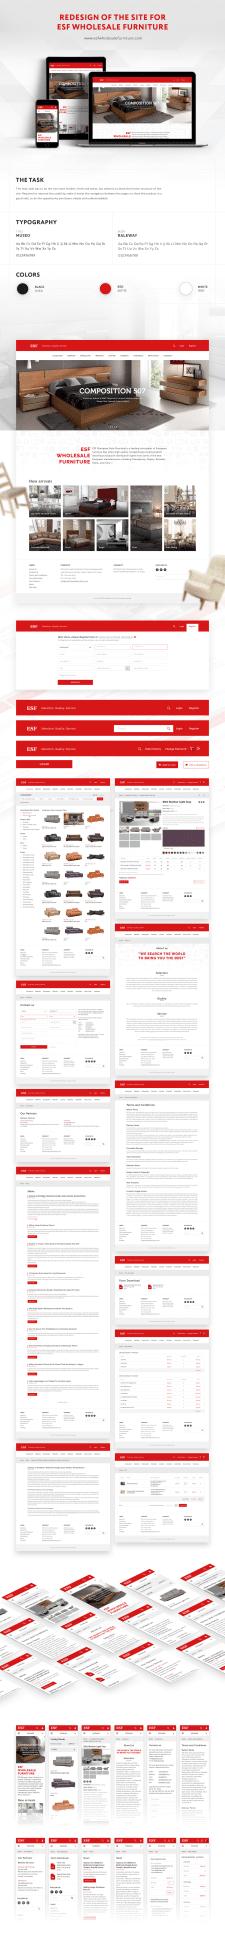 Корпоративный сайт с каталогом ESF Wholesale Furni